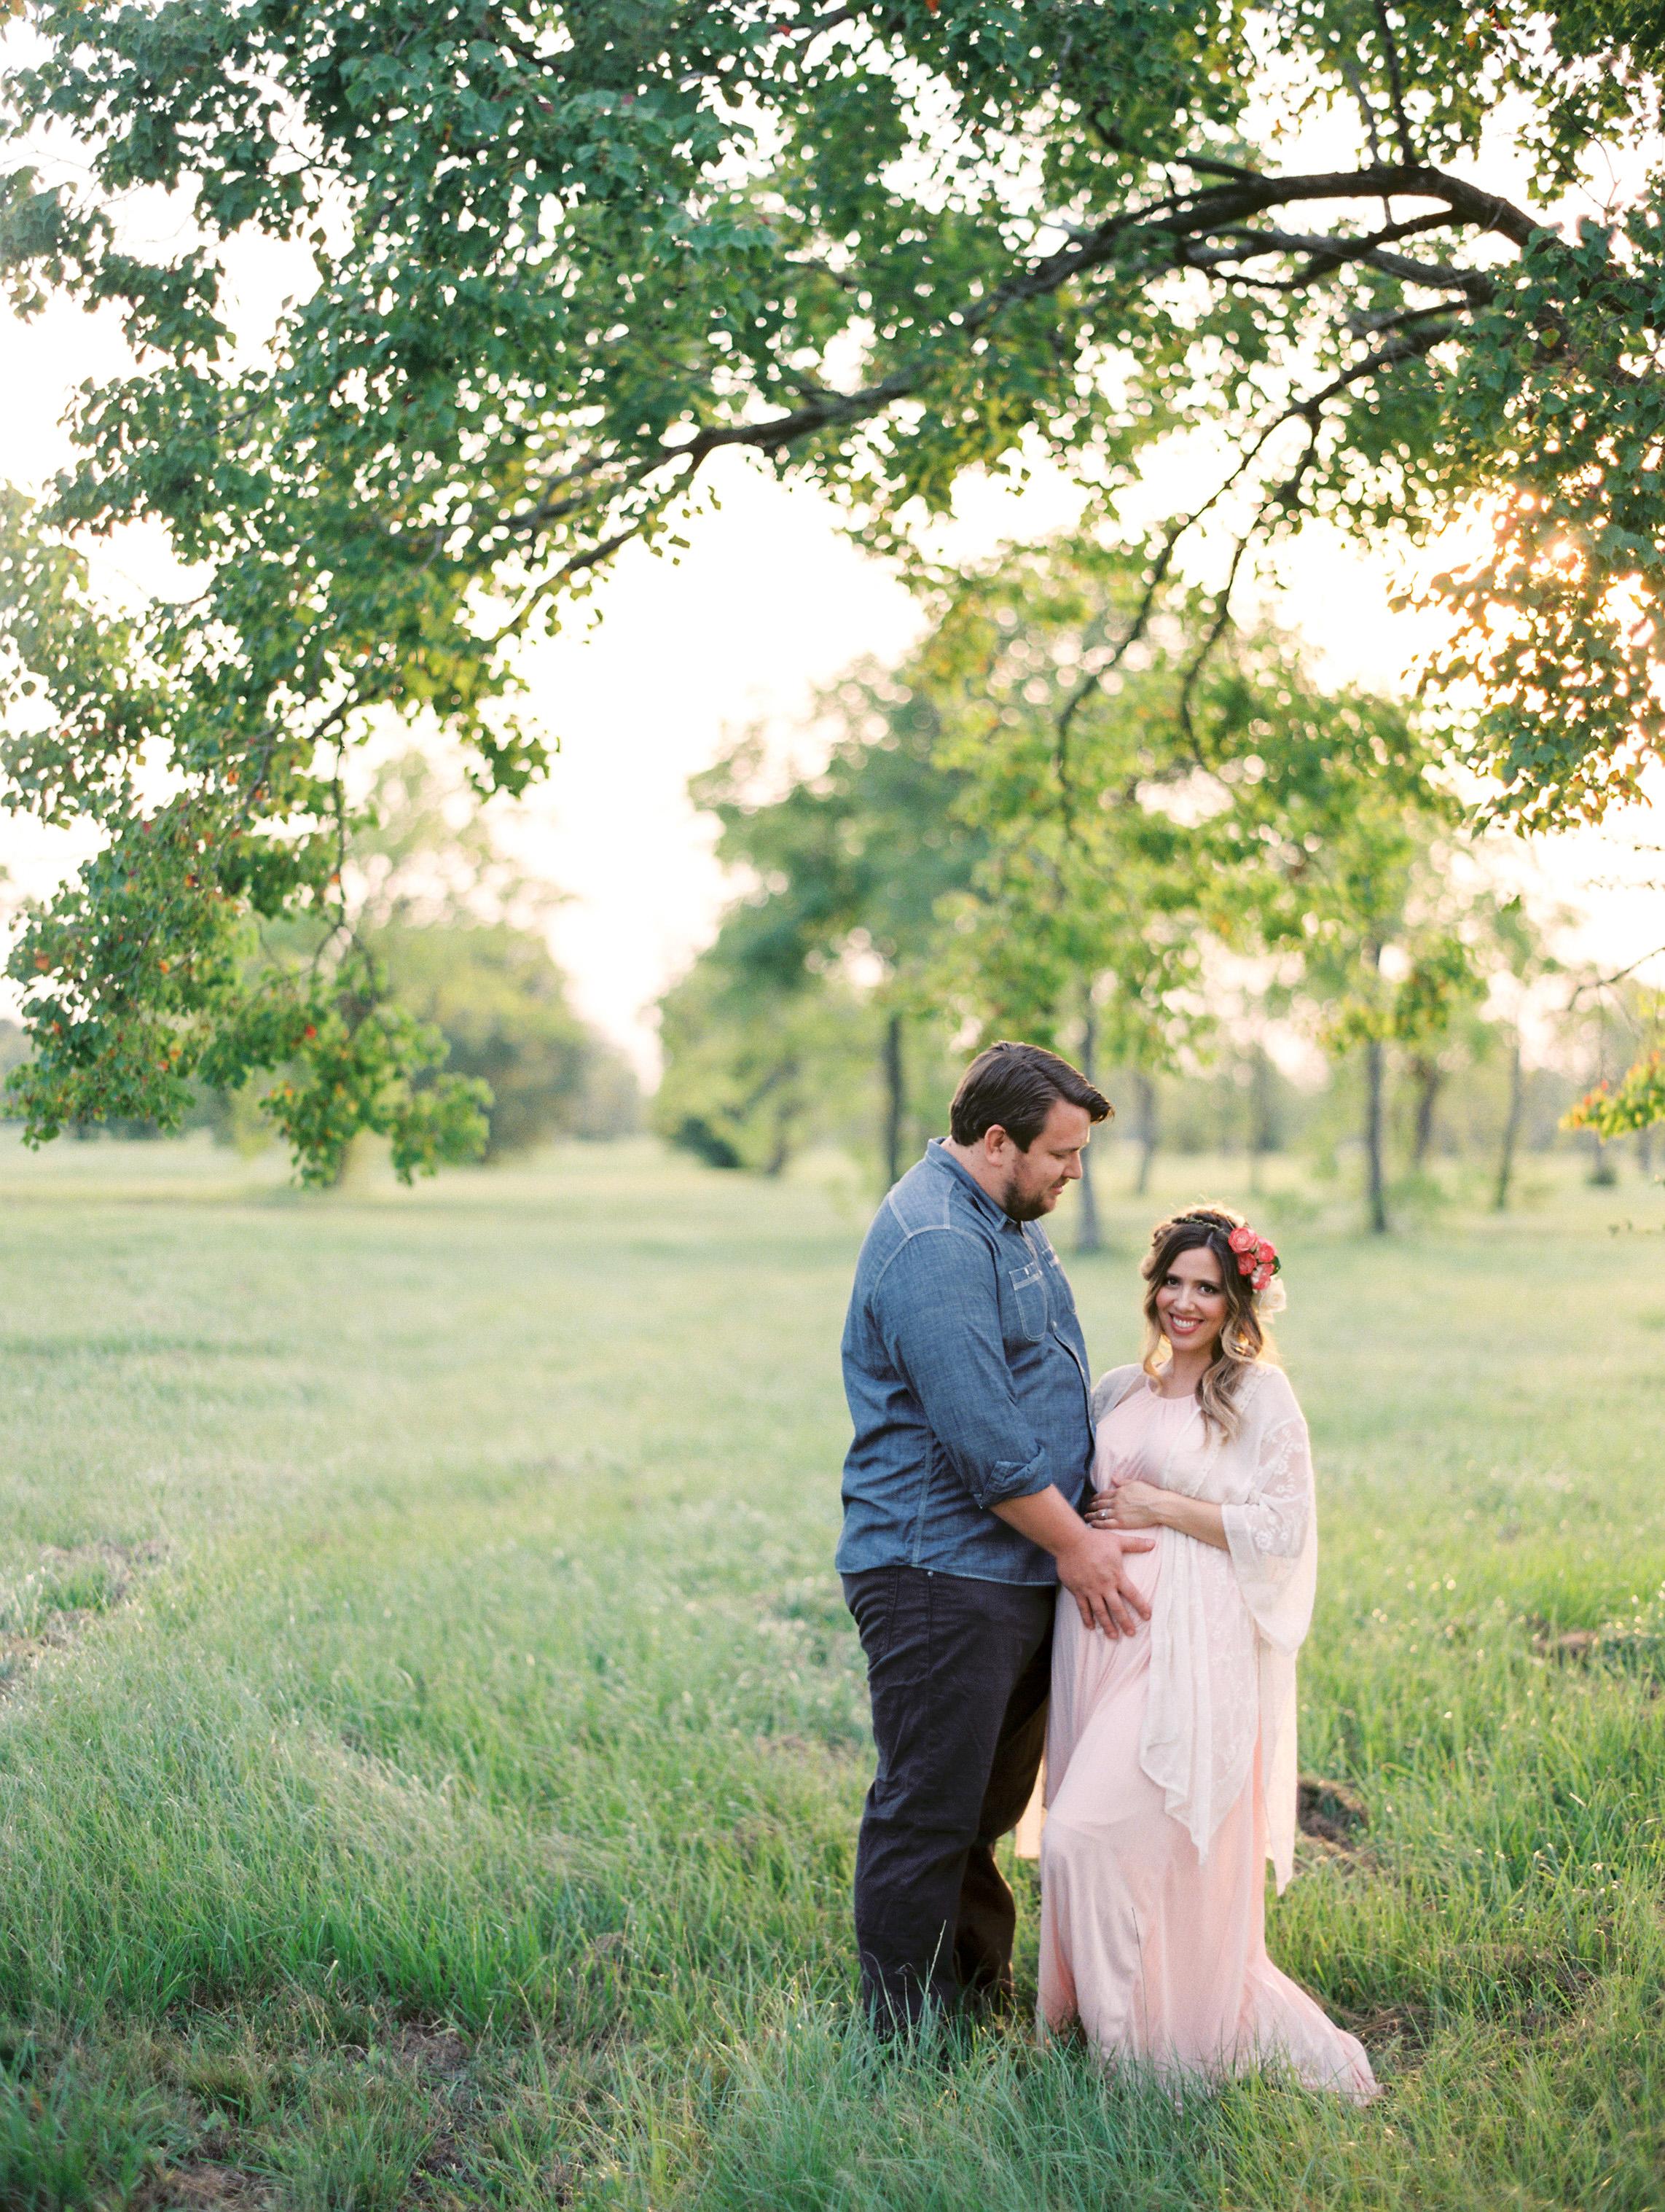 Dana-Fernandez-Photography-Houston-Maternity-Family-Portrait-Photographer-Film-11.jpg